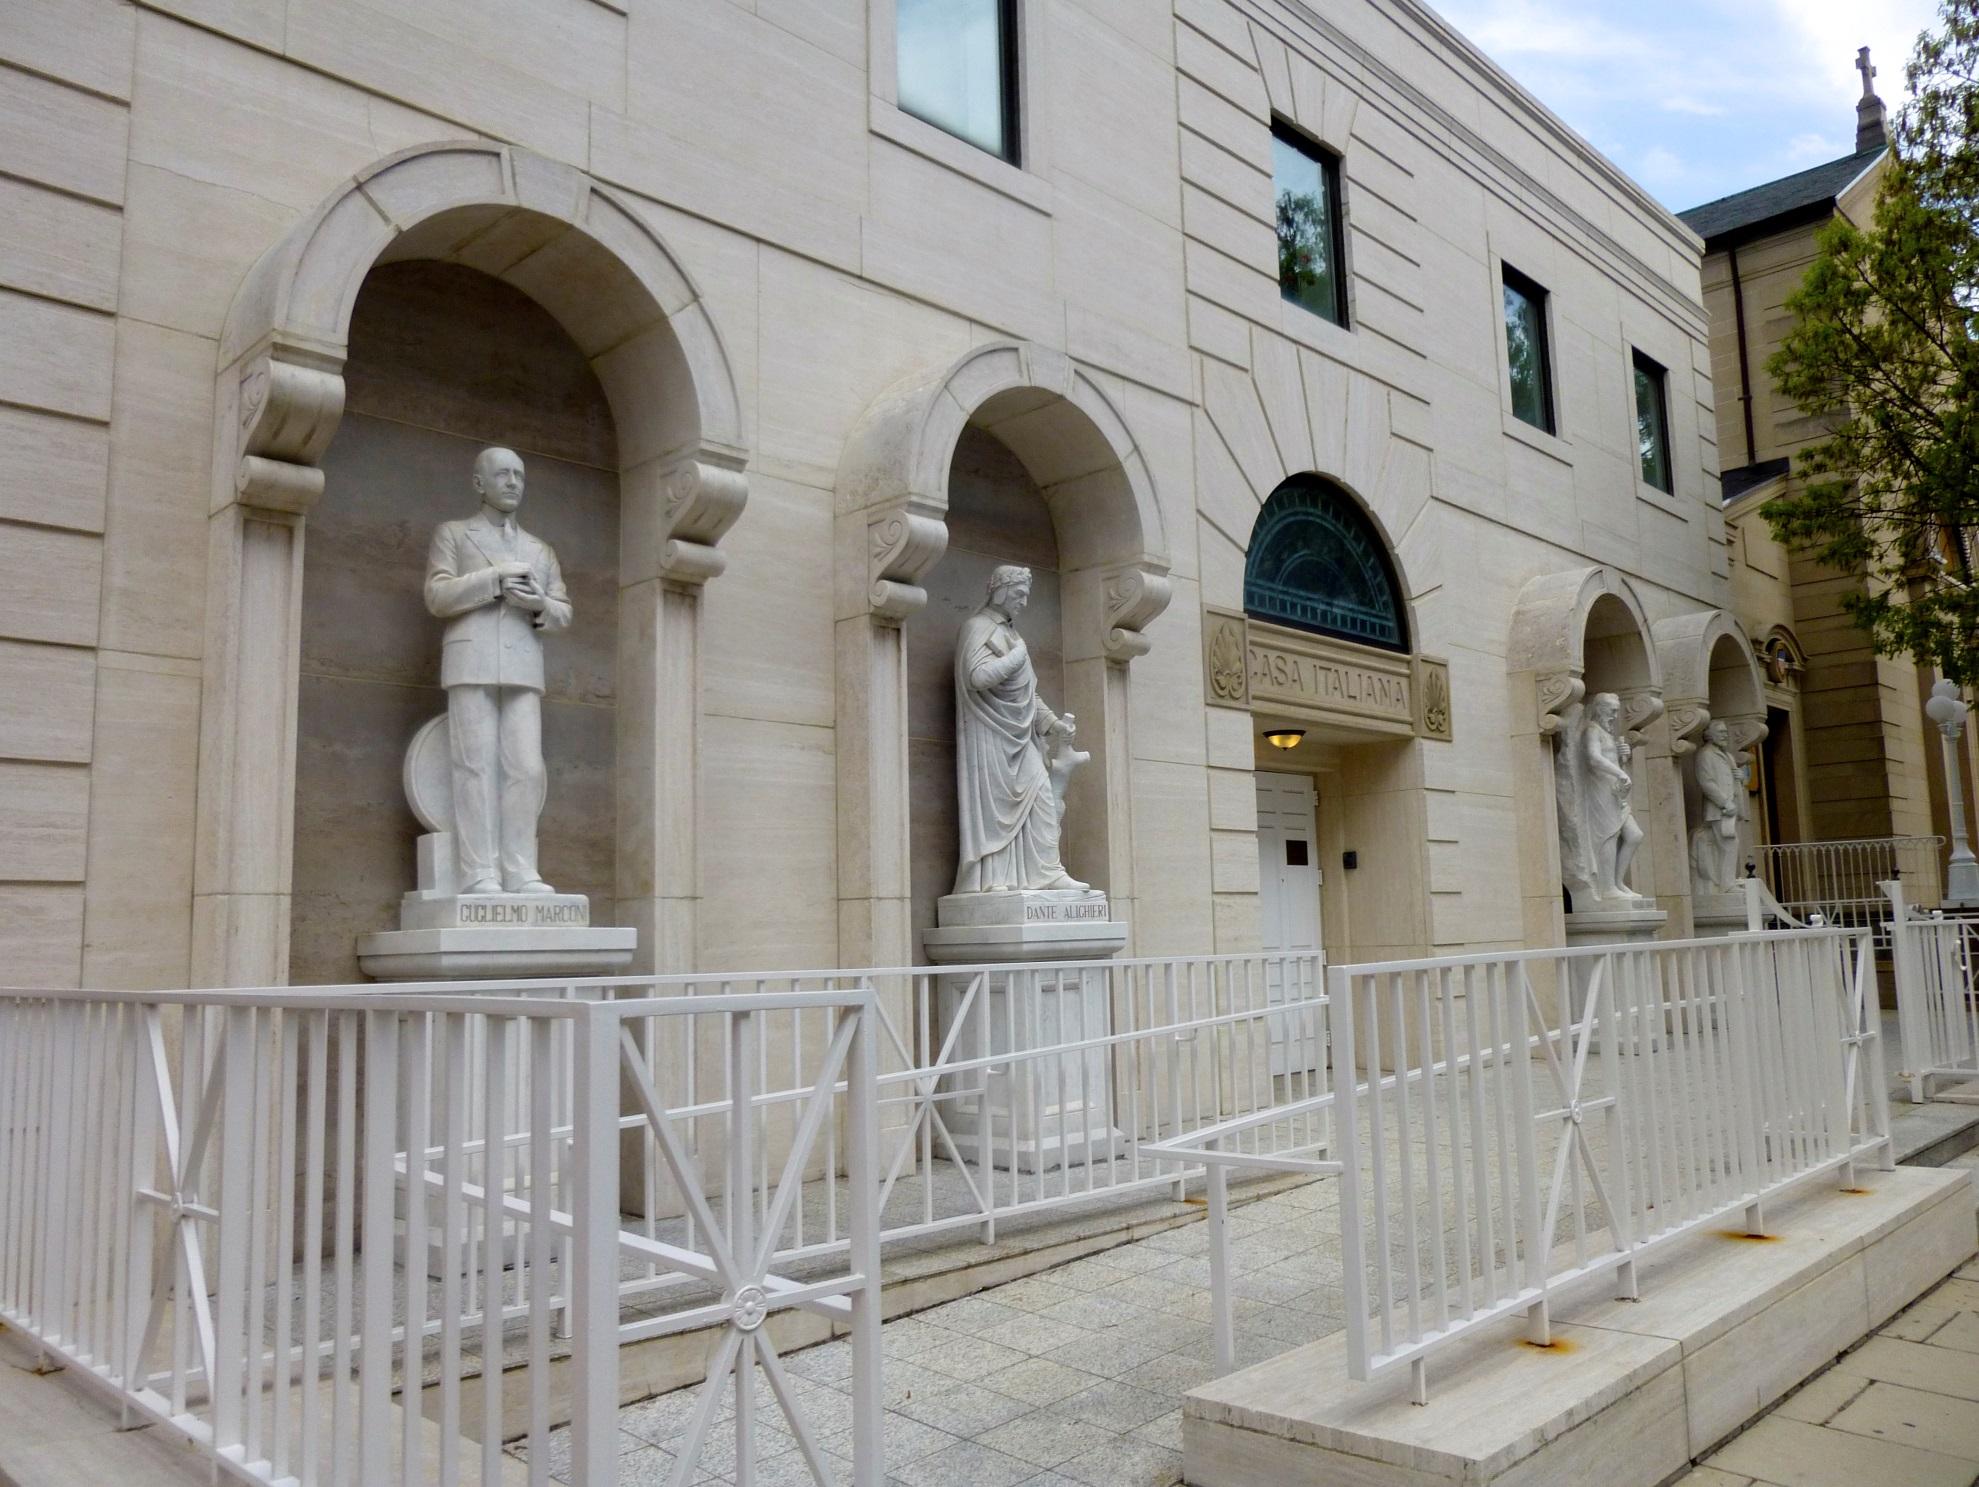 Casa Italiana Sociocultural Center